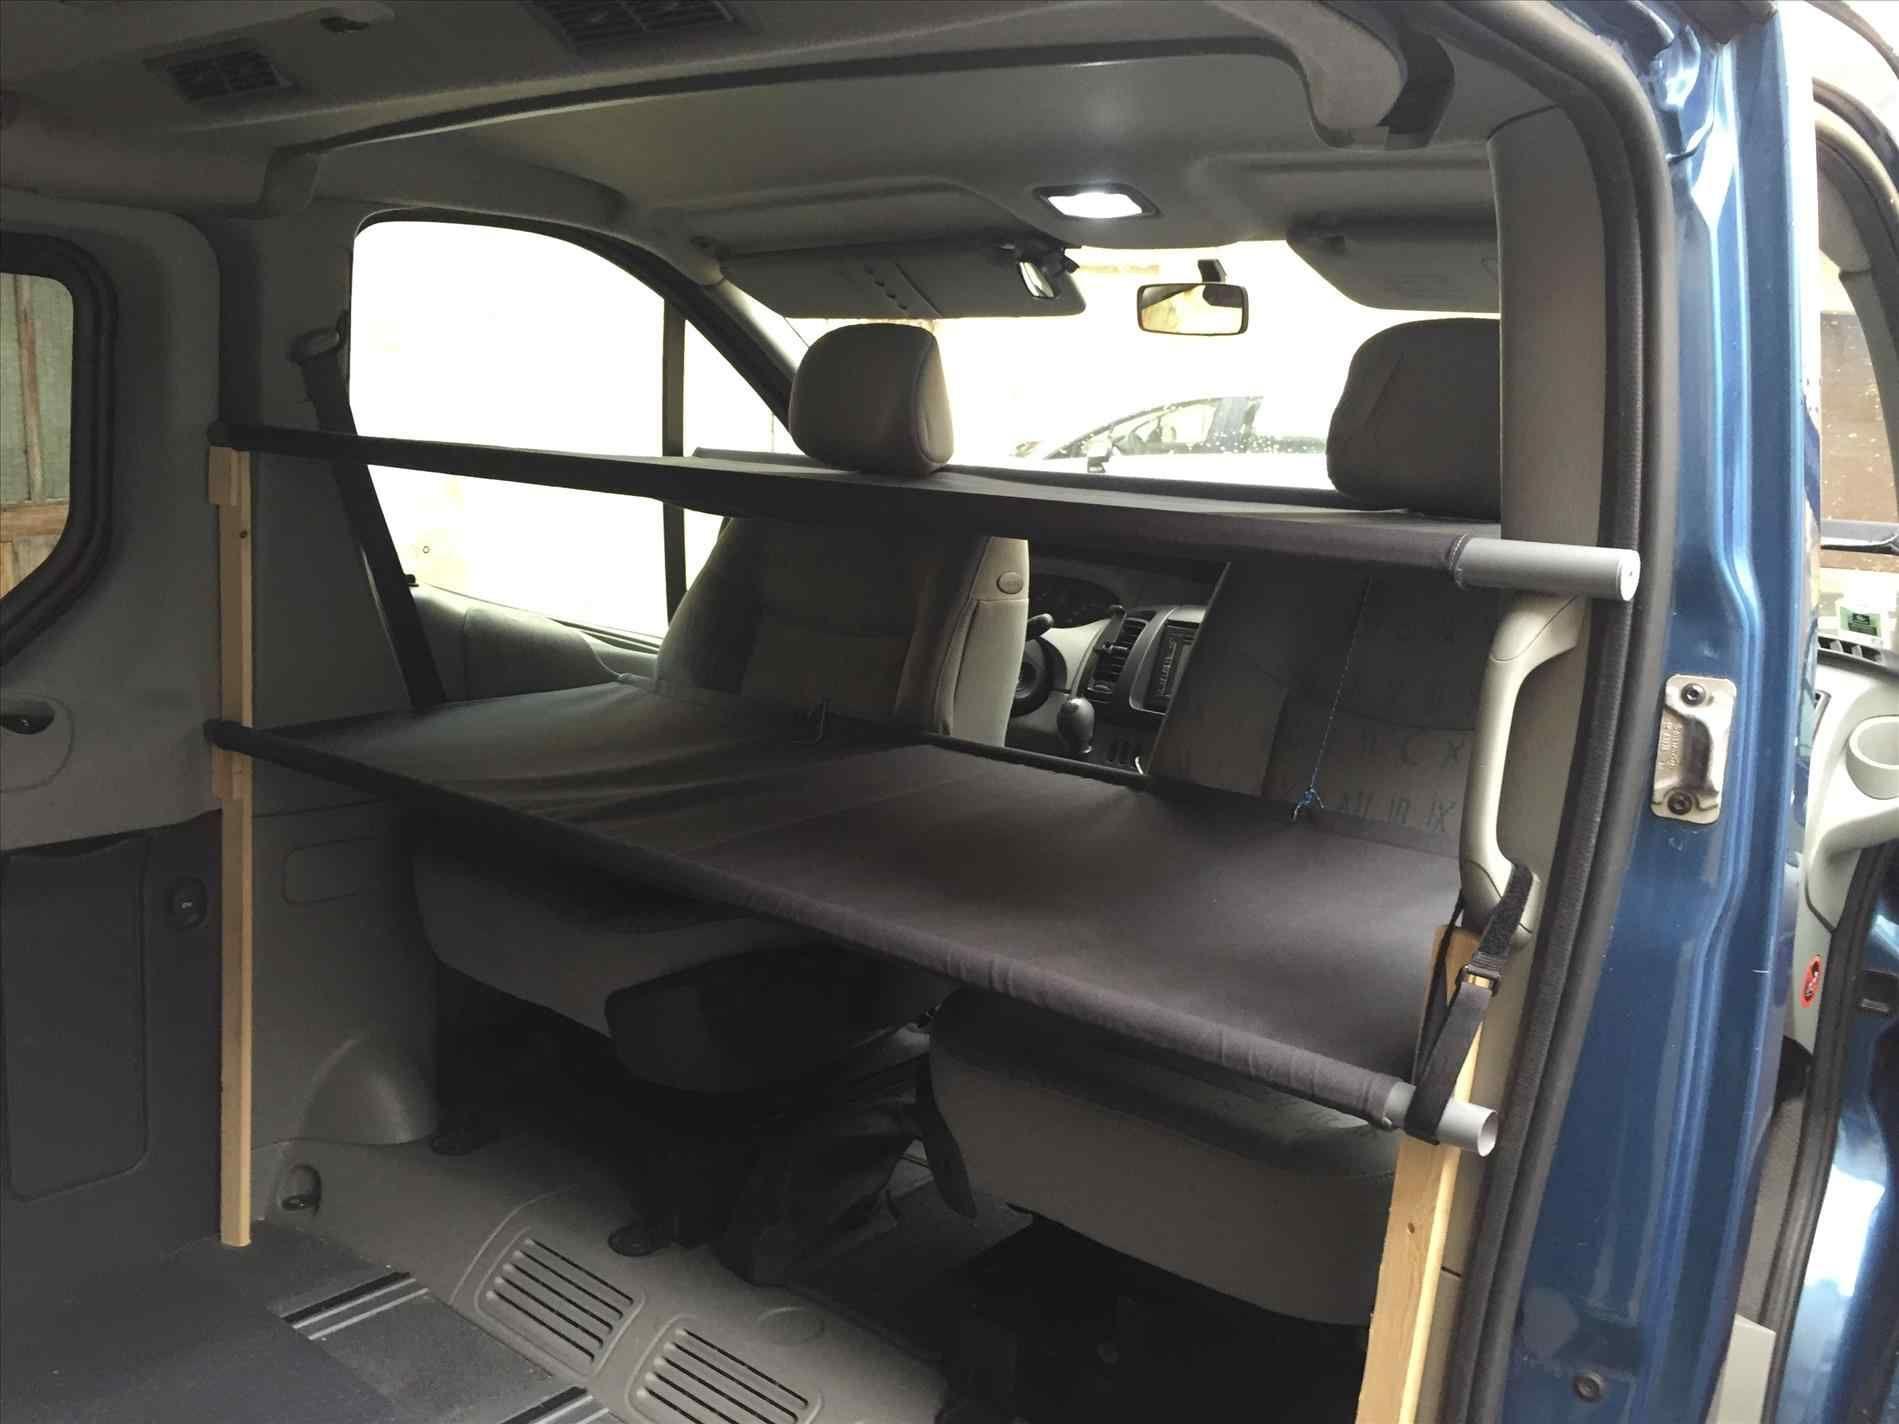 Surveillance Van Conversions Uk Custom Mercedes Sprinter Makes